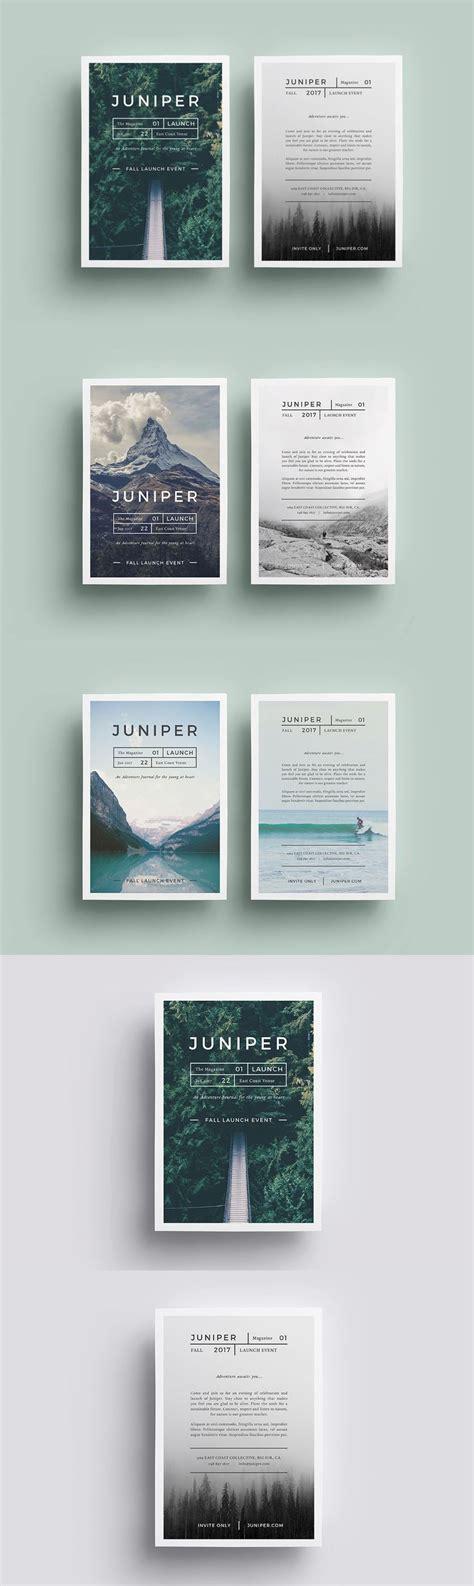 design flyer pinterest best 25 flyer design ideas on pinterest graphic design